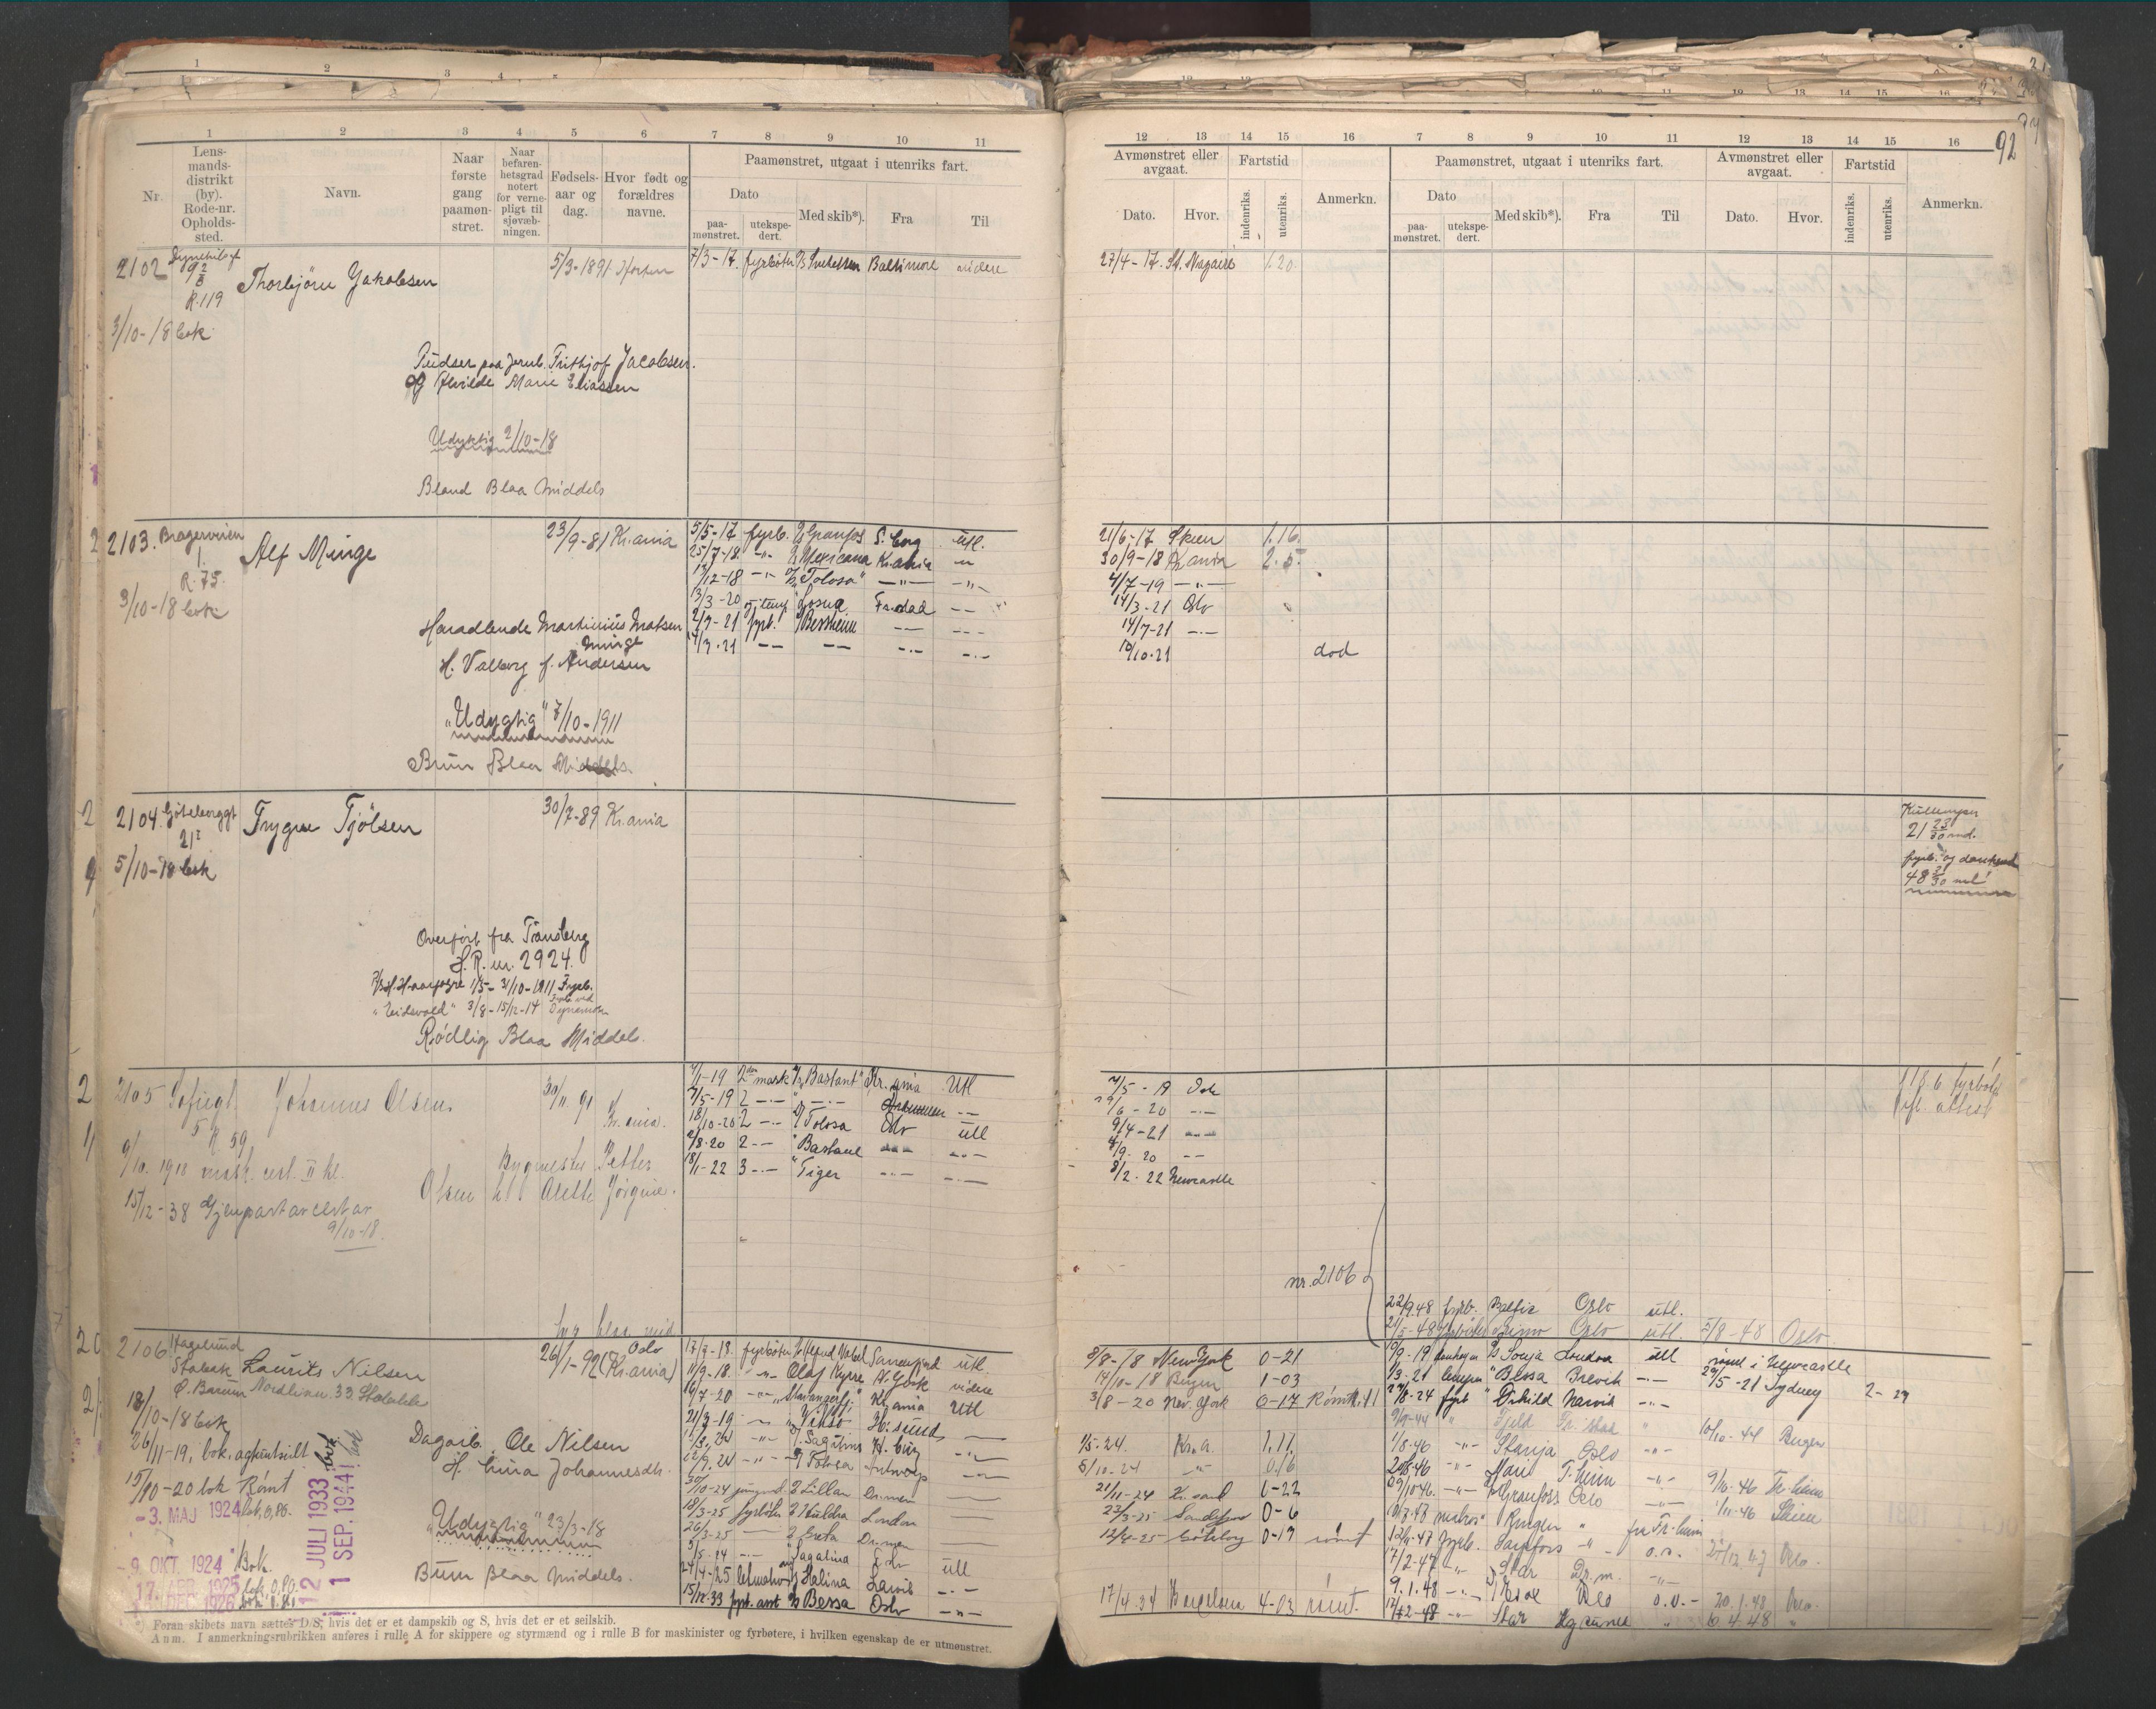 SAO, Oslo sjømannskontor, F/Fd/L0003: B-rulle, 1916, s. 91b-92a